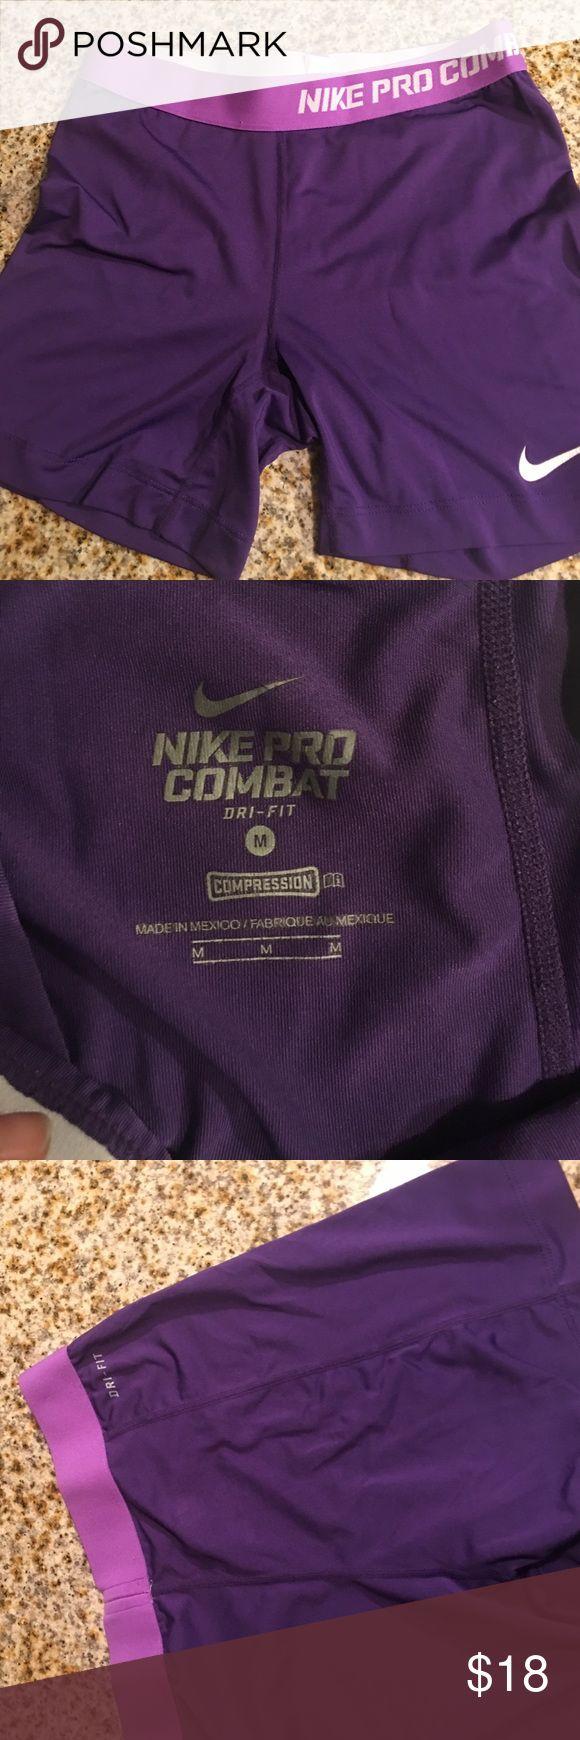 Nike pro combat spandex shorts Nike pro combat spandex shorts sz m 🤗 Nike Shorts